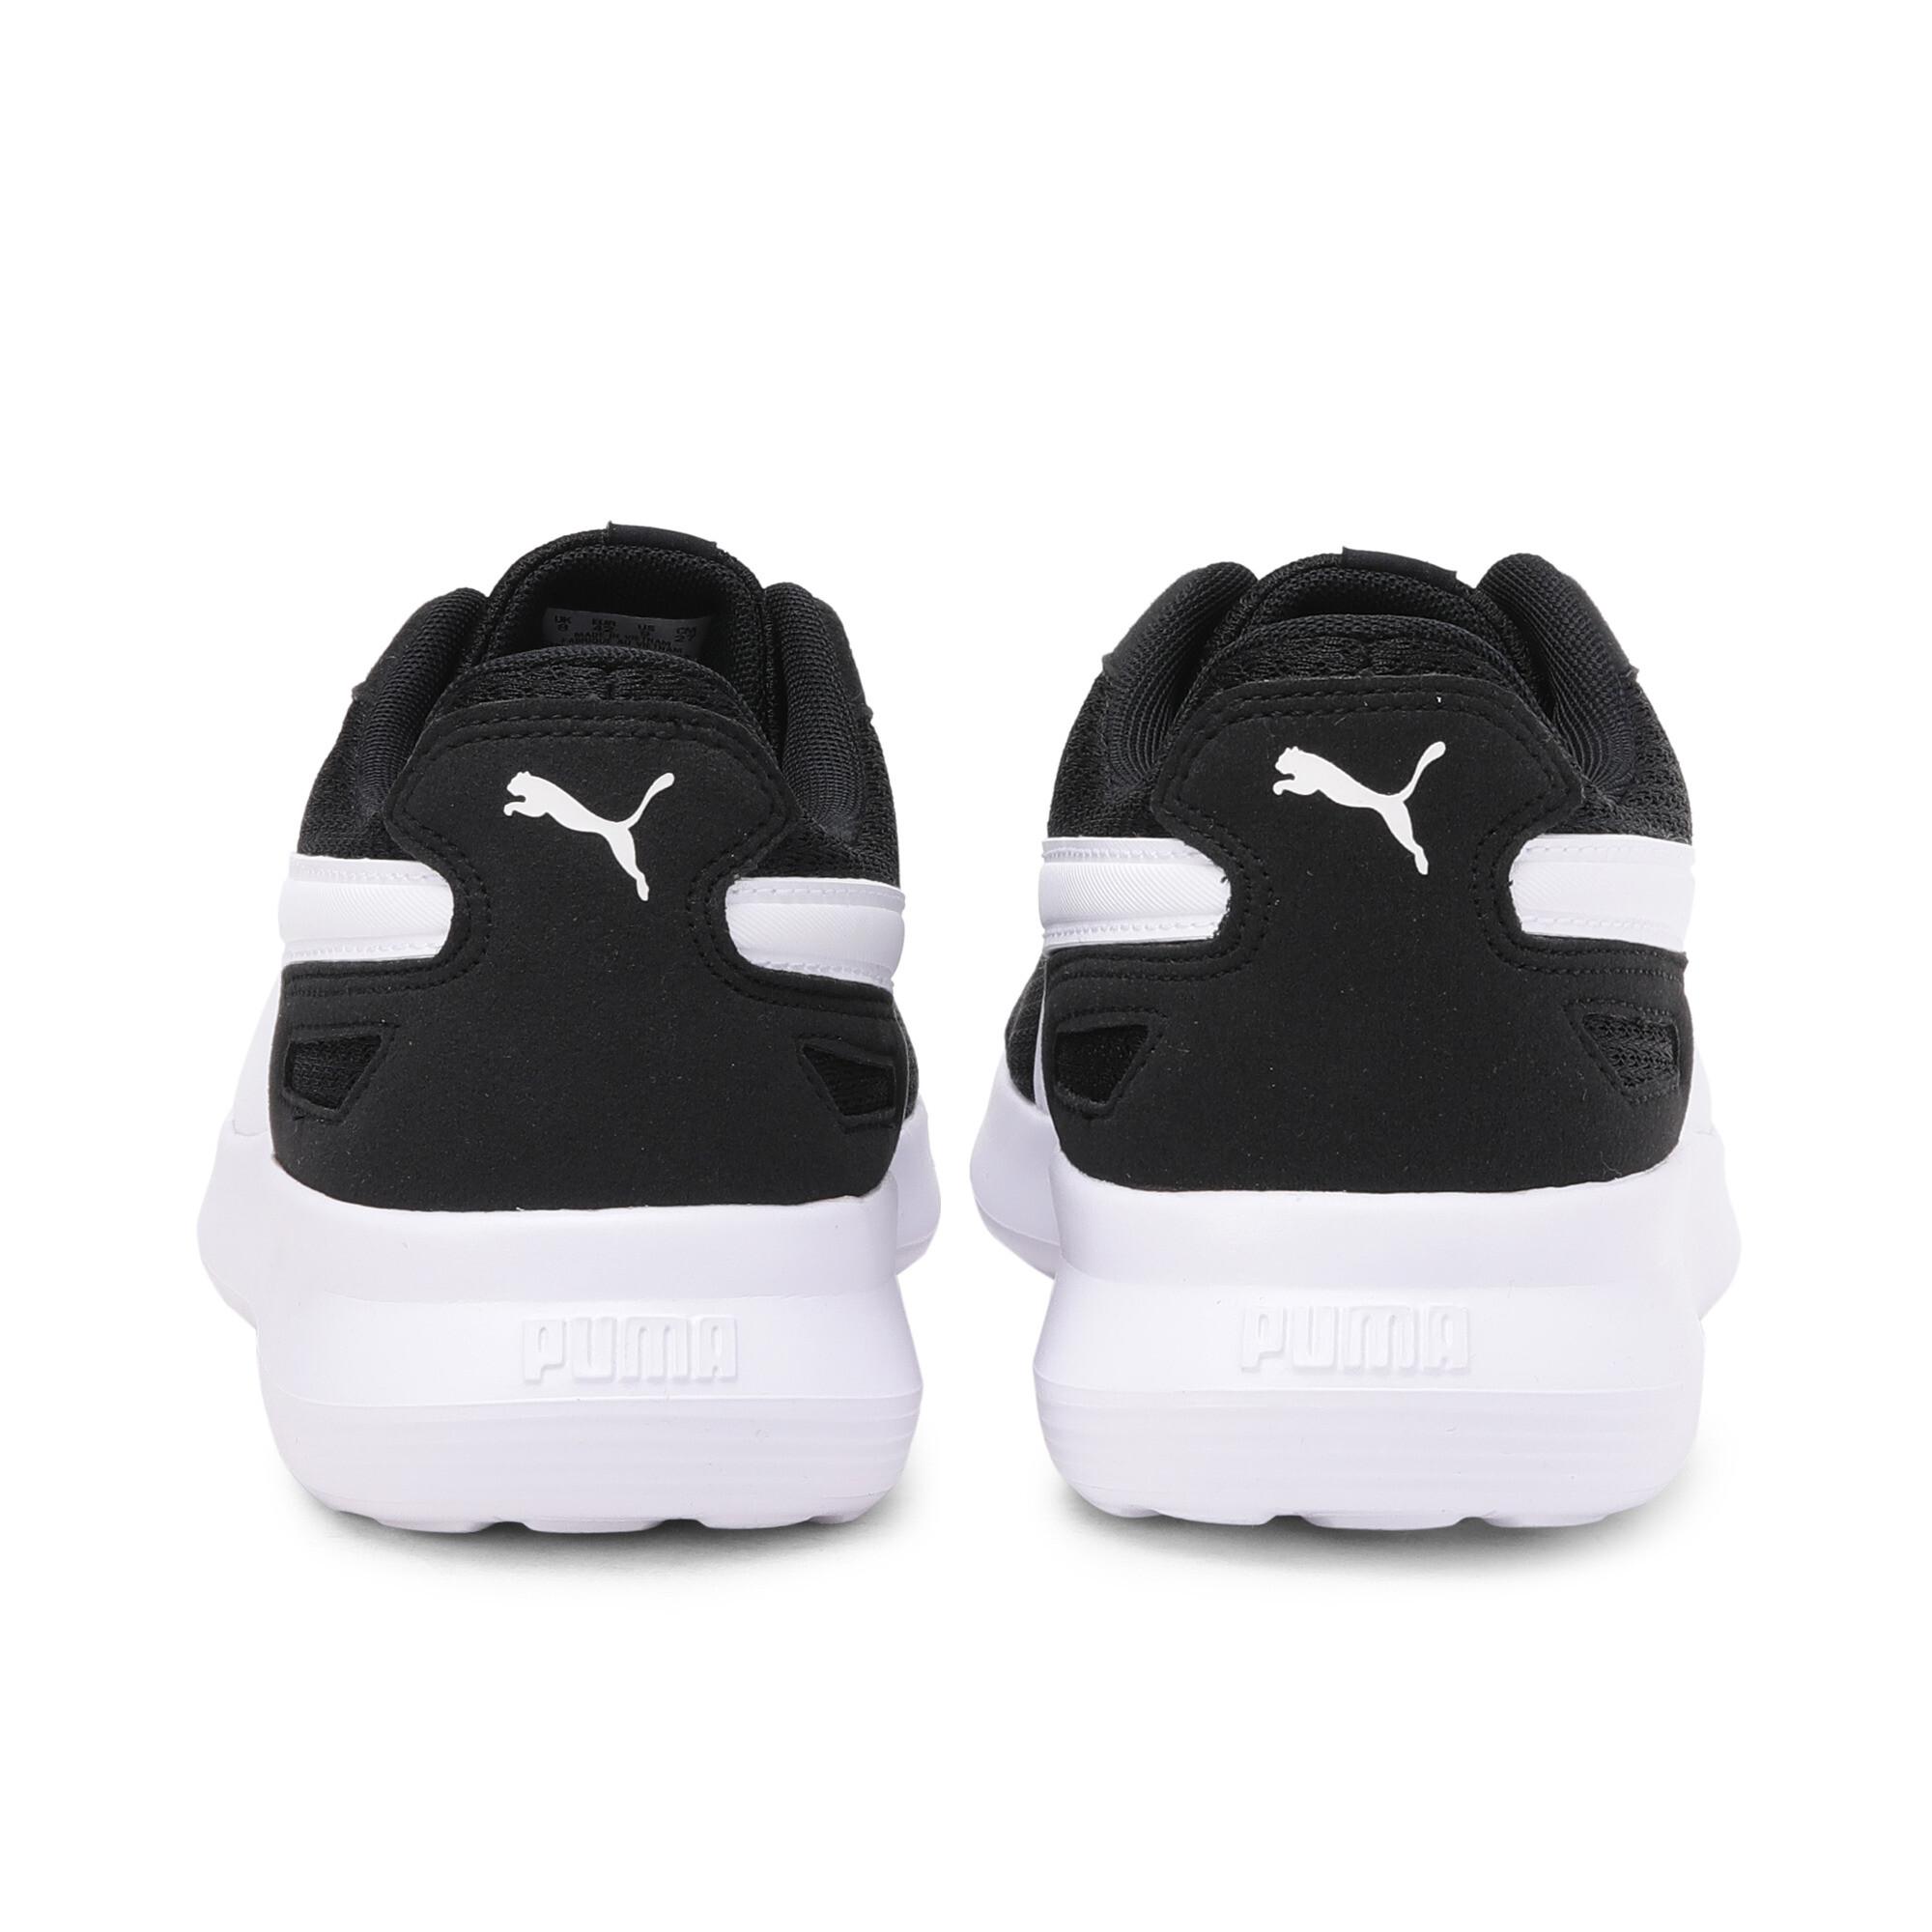 PUMA-Men-039-s-ST-Activate-Sneakers thumbnail 8